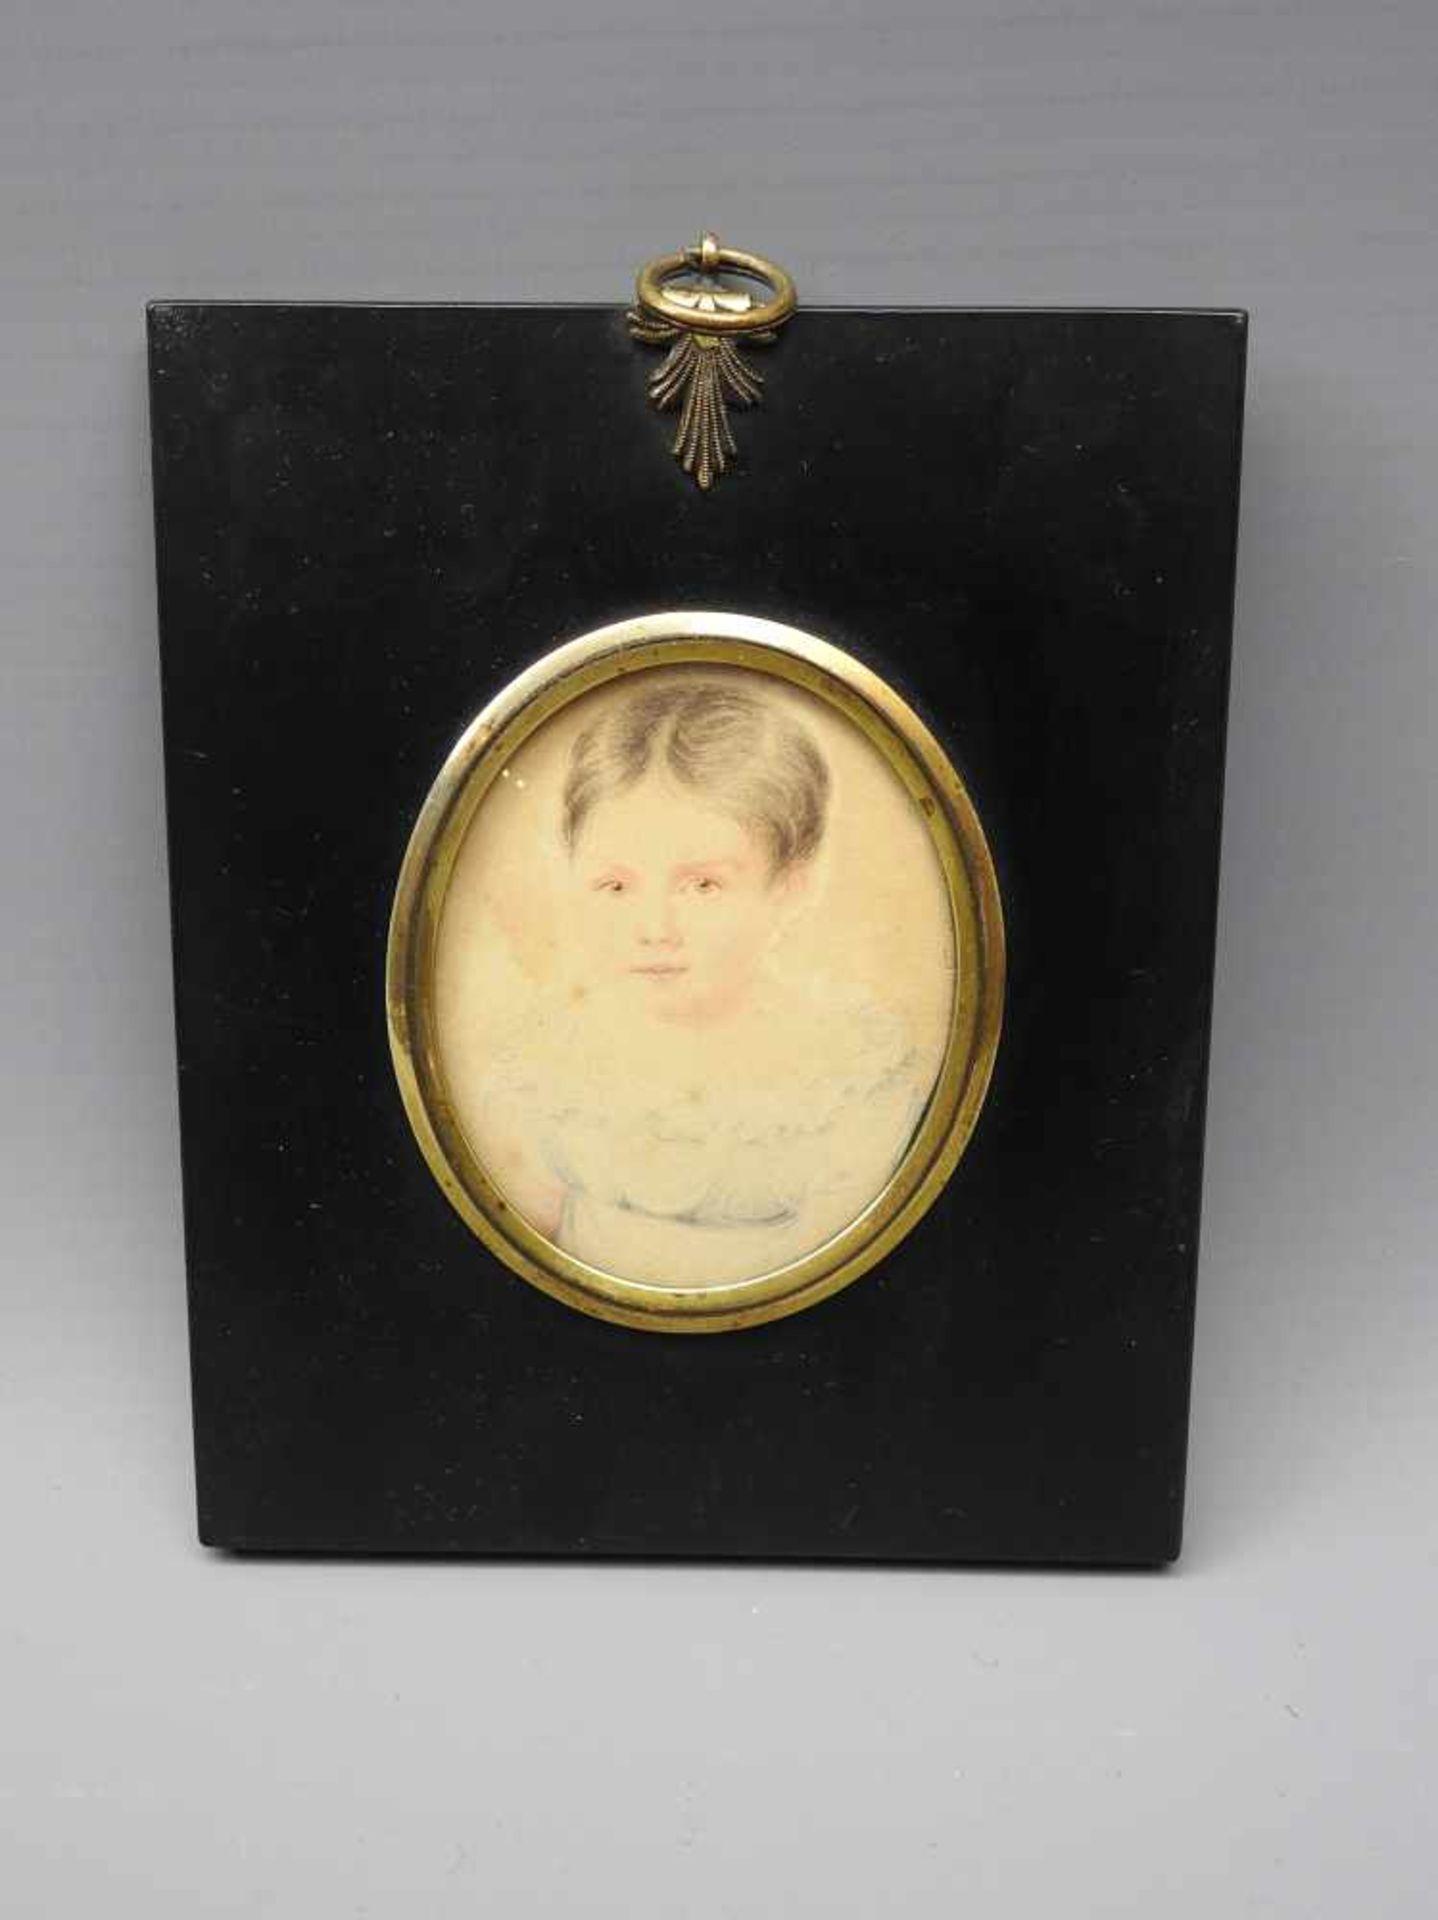 Miniatur-MädchenporträtPastell/Malkarton. Biedermeierporträt eines jungen Mädchens. Unsigniert.